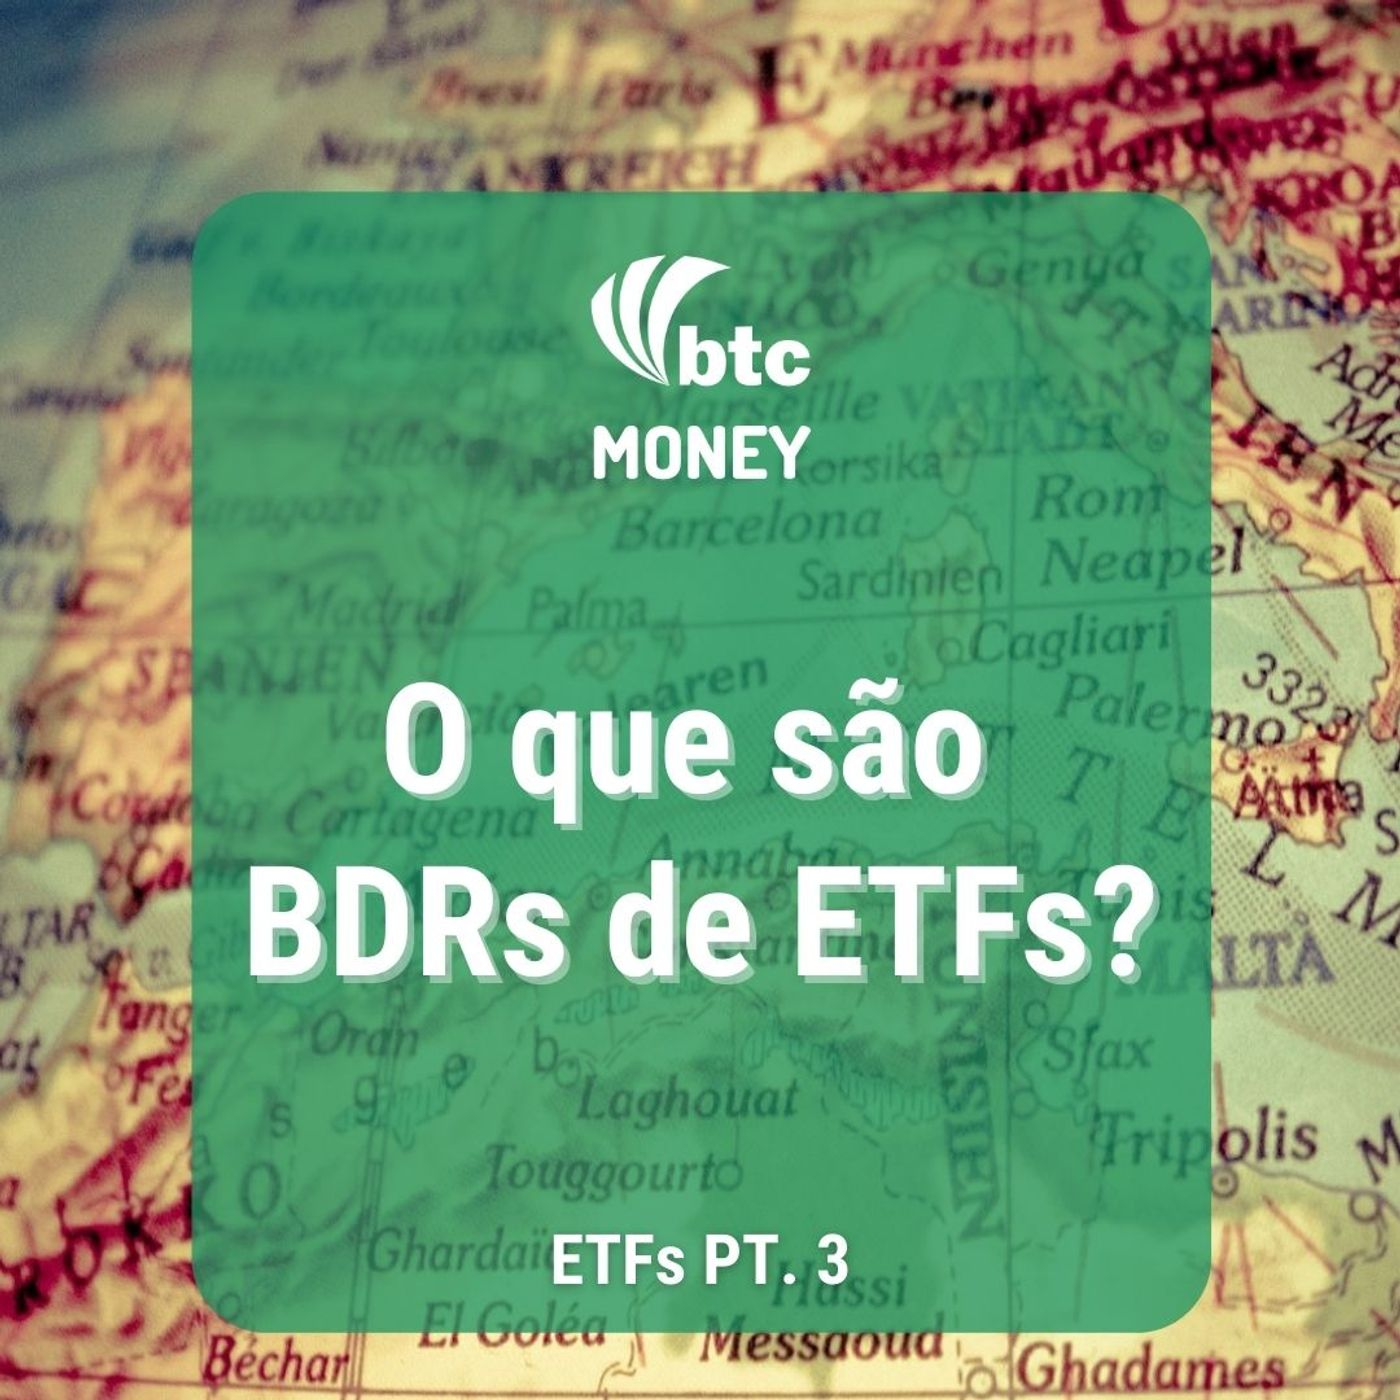 Mercado Internacional e BDRs de ETFs - ETFs pt. 3   Money #66